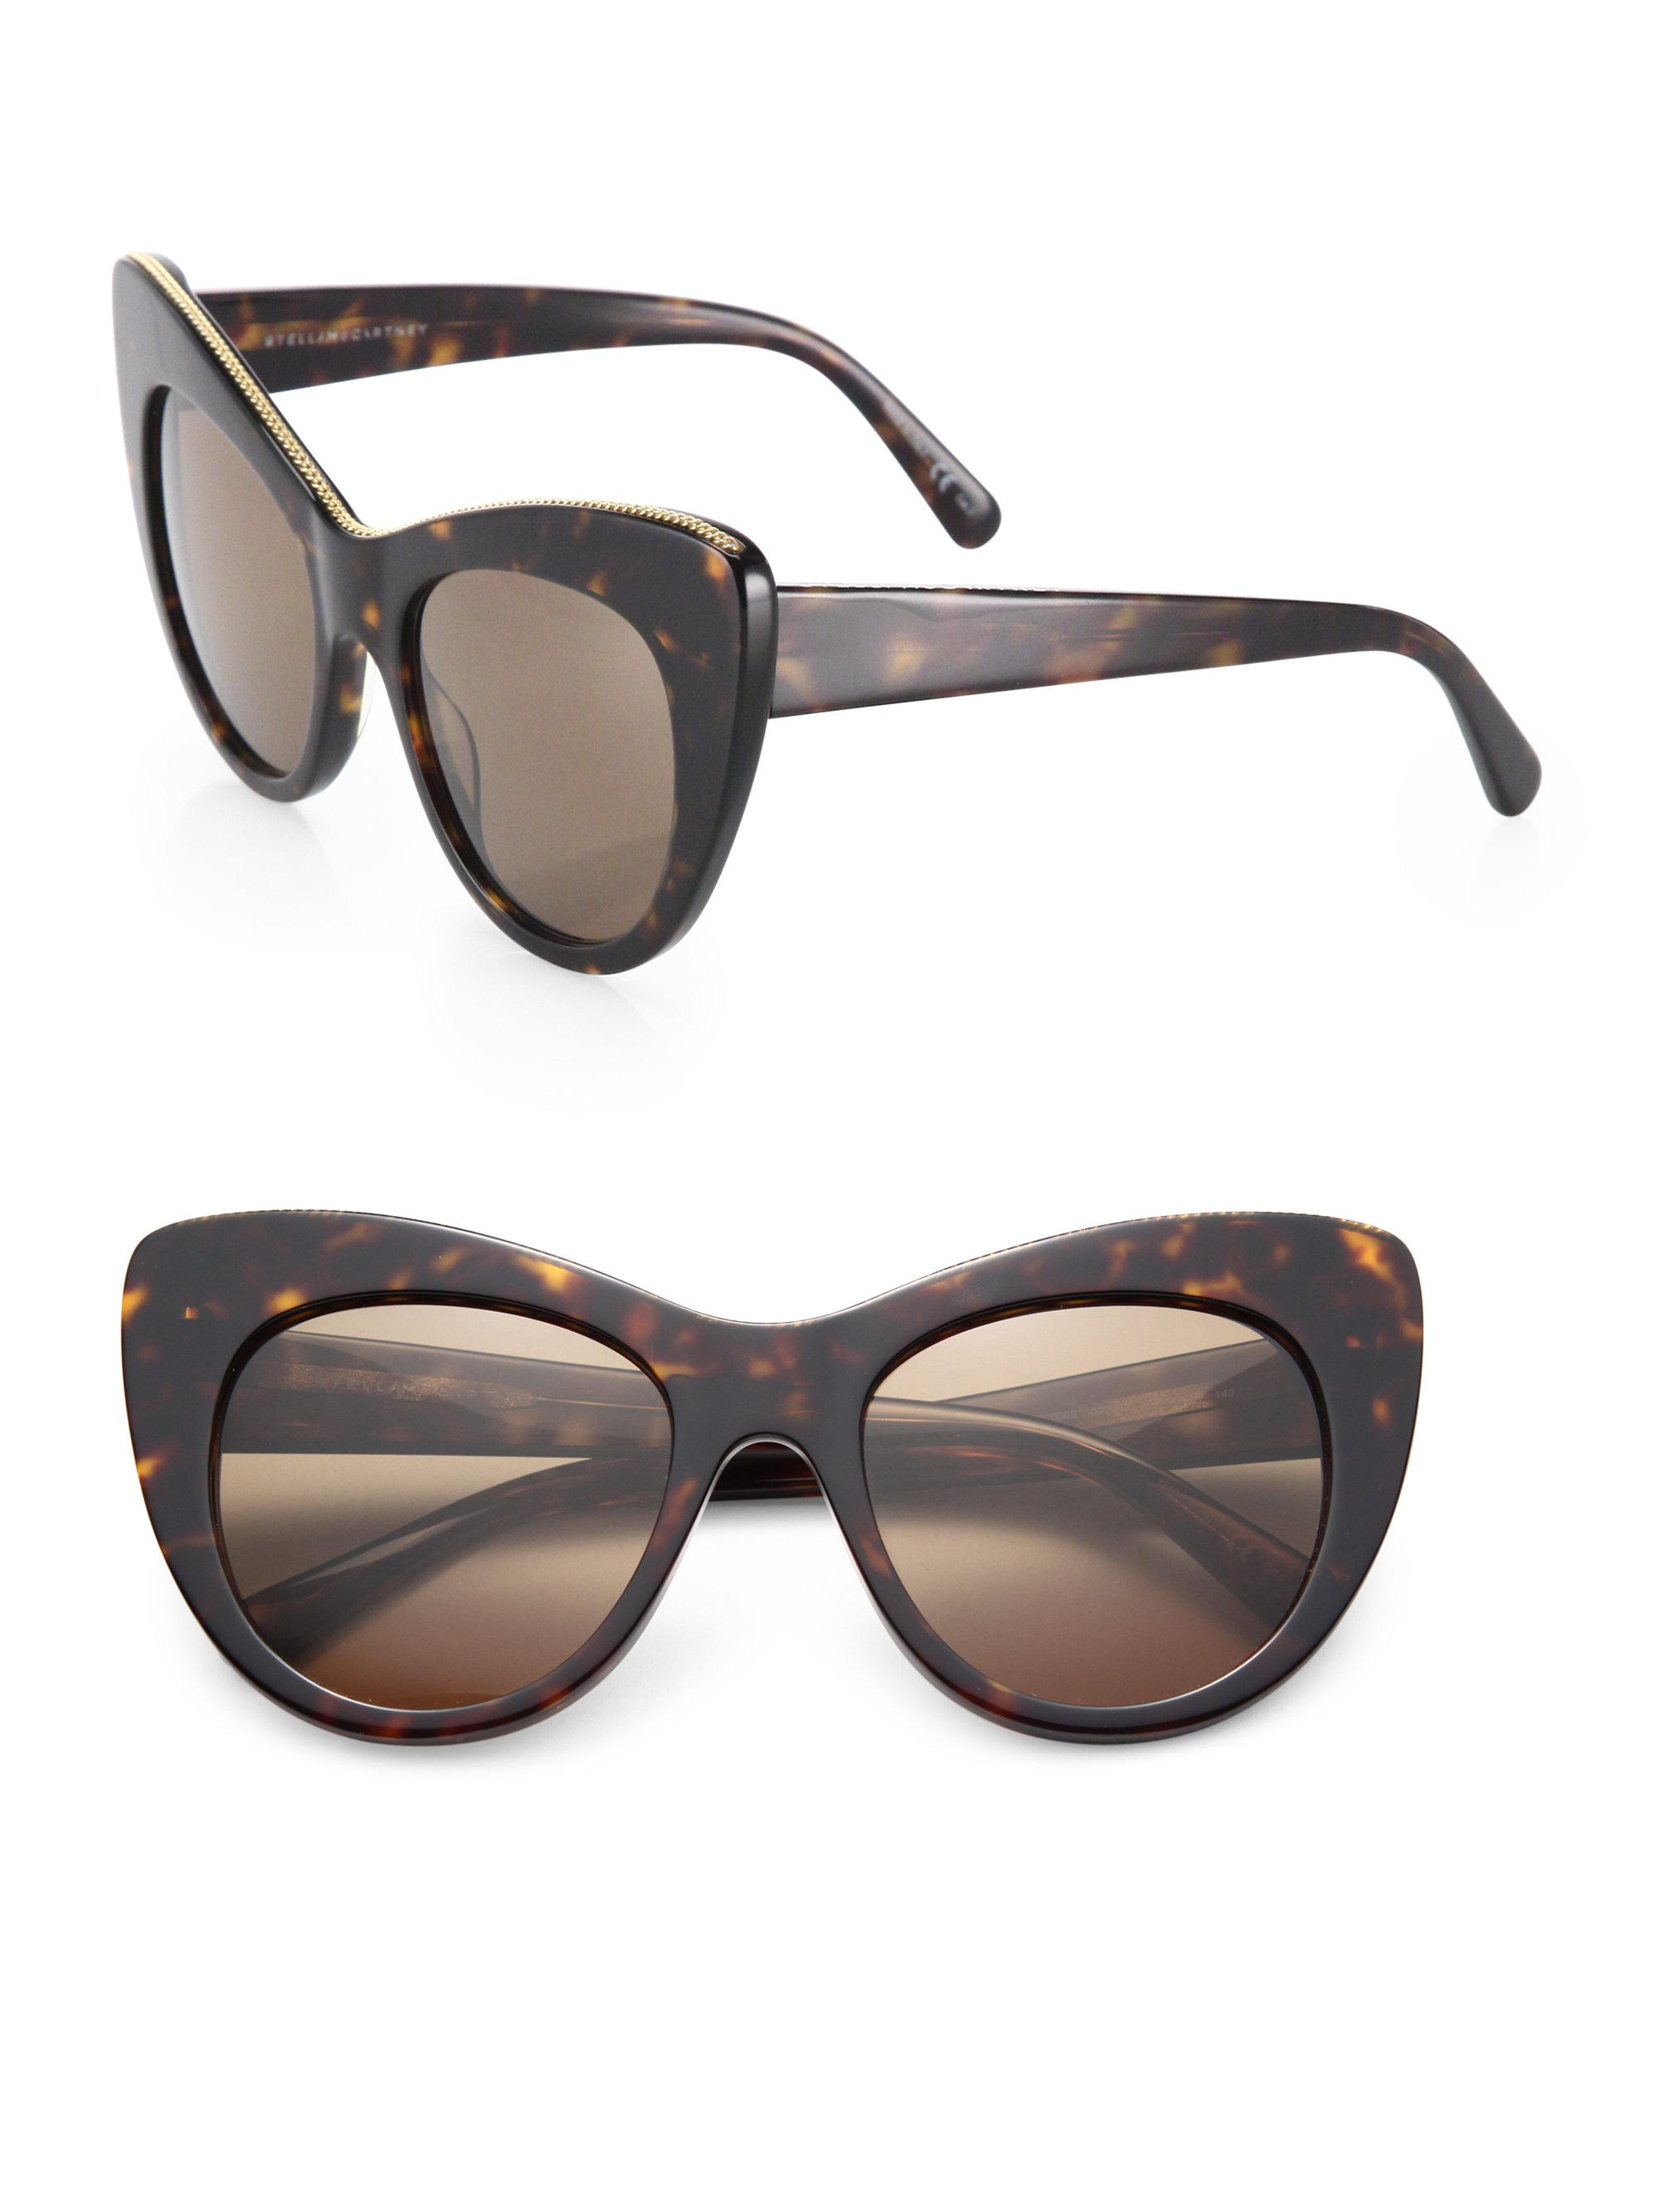 48b311e136641 Stella McCartney. Women s Black Falabella Chain 53mm Oversized Cat s-eye  Sunglasses